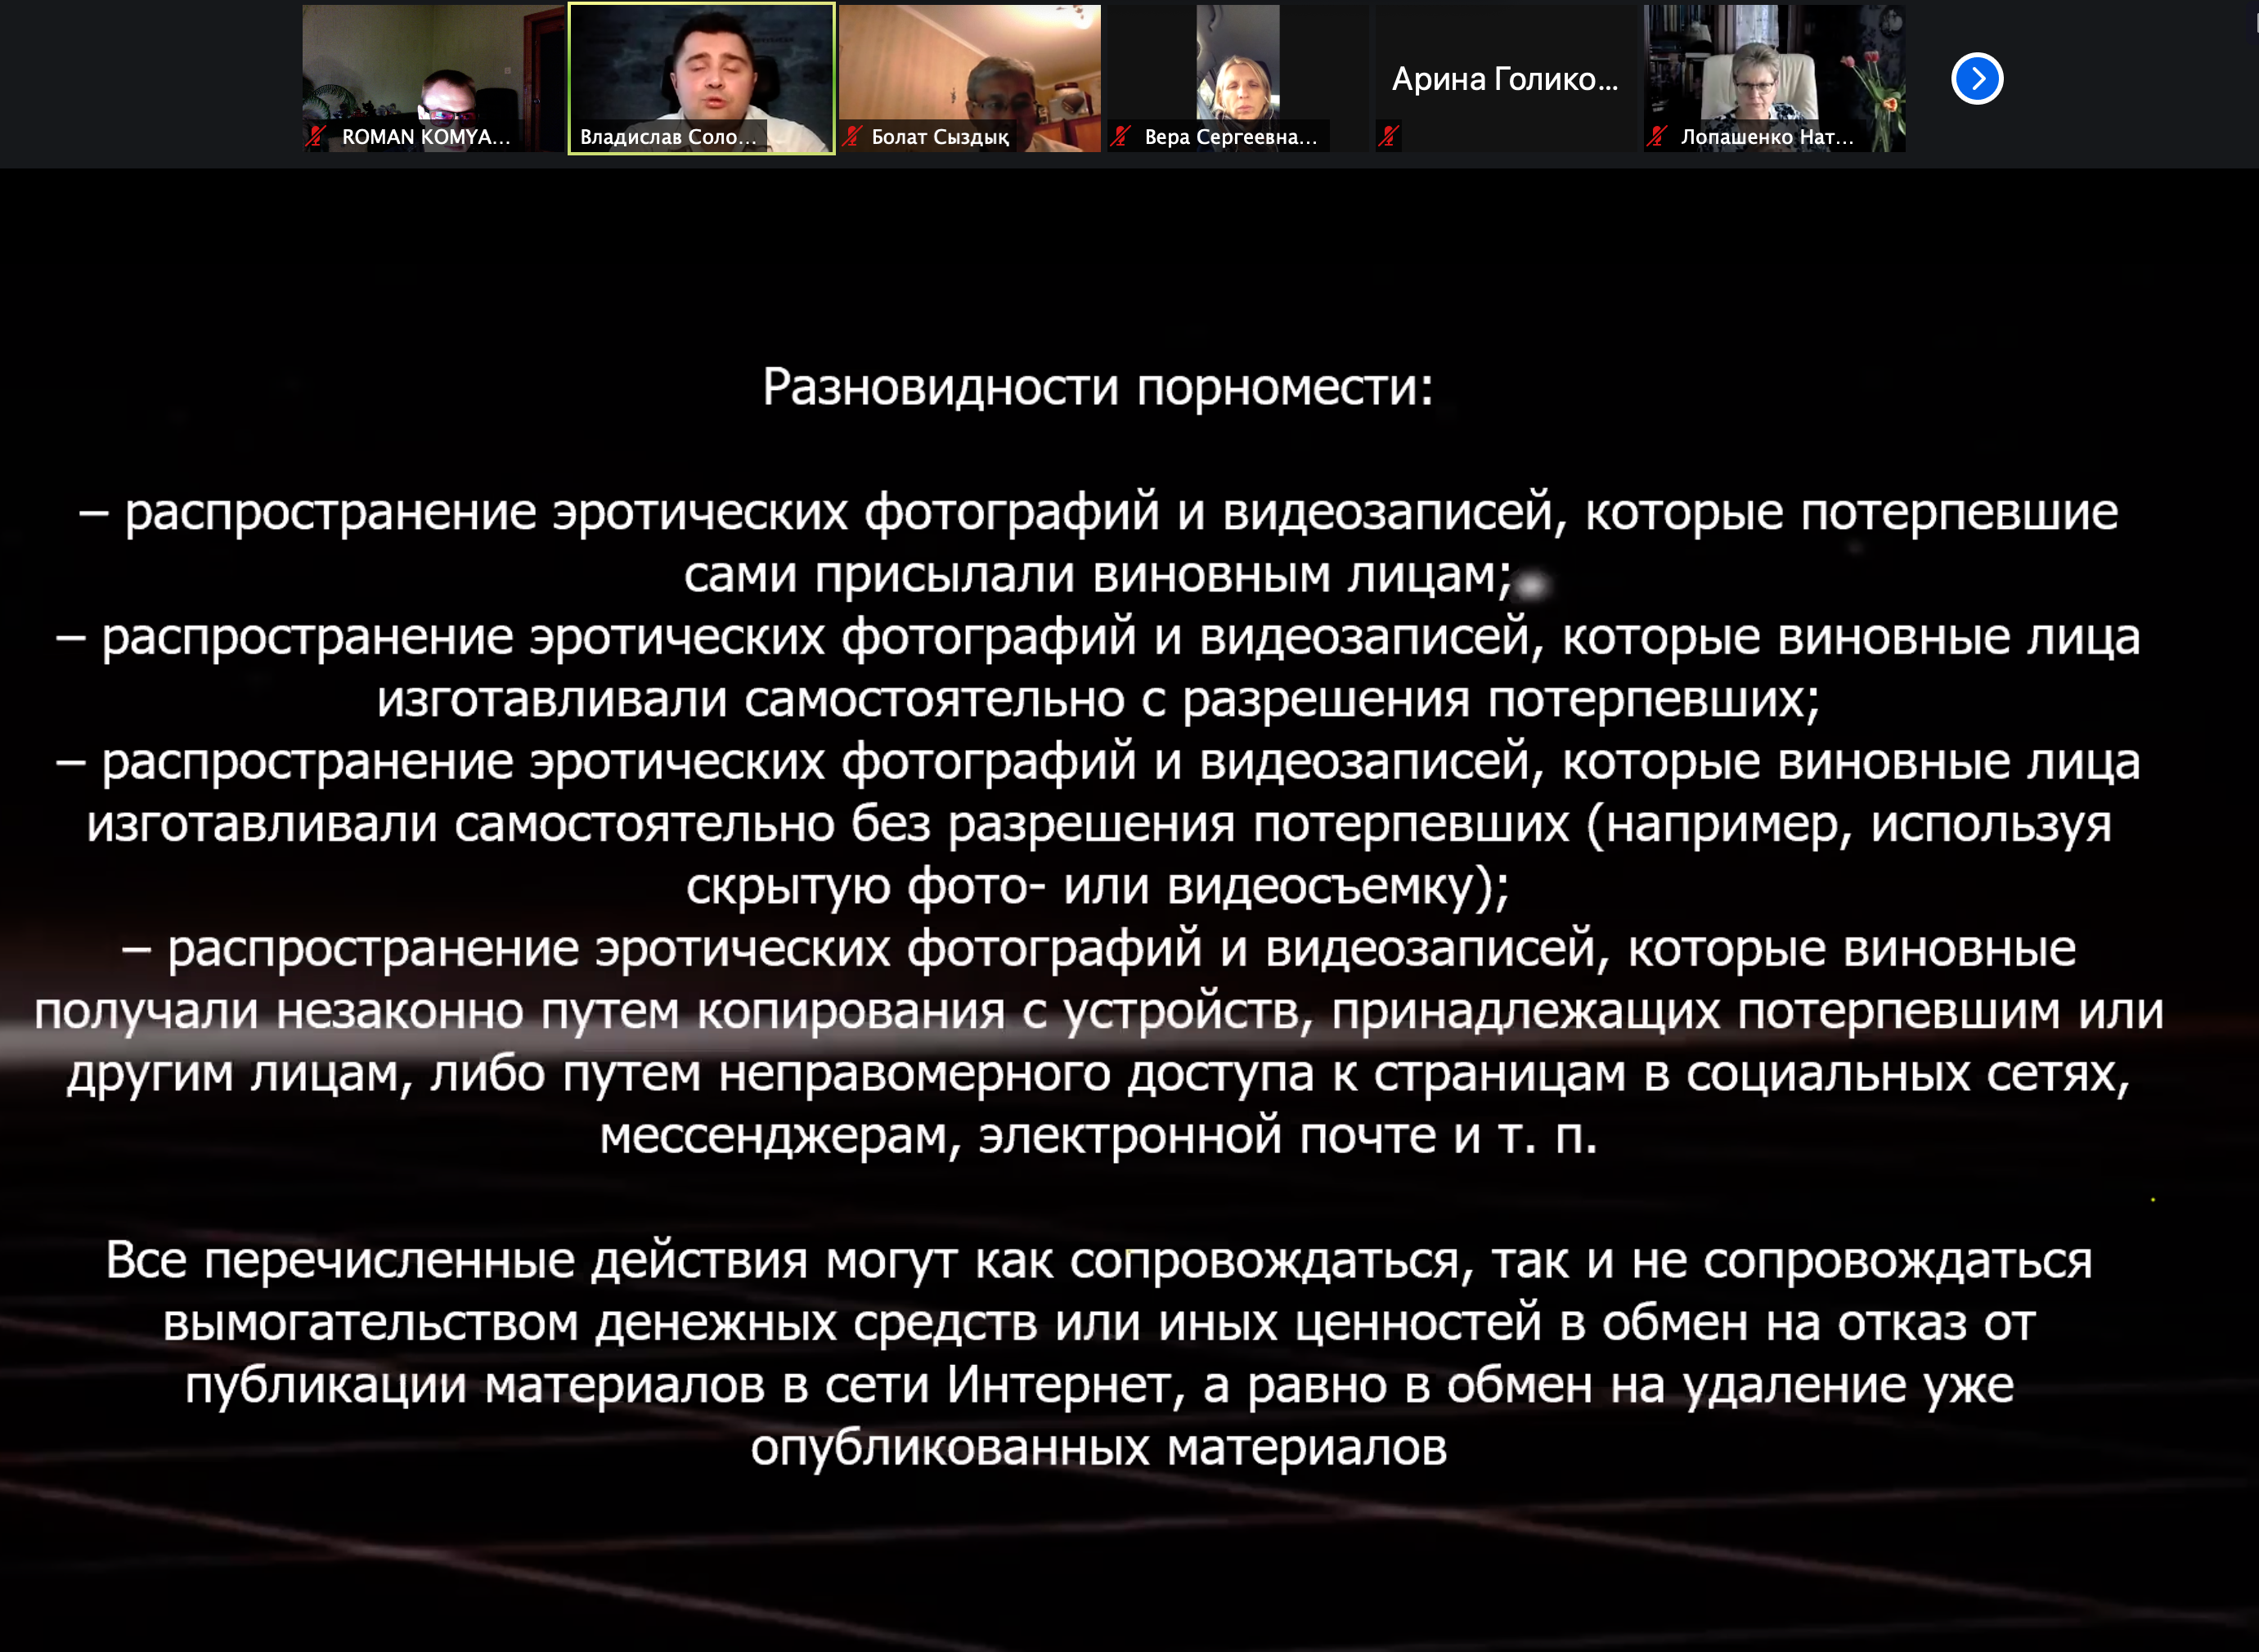 Снимок экрана 2020-10-22 в 16.34.44